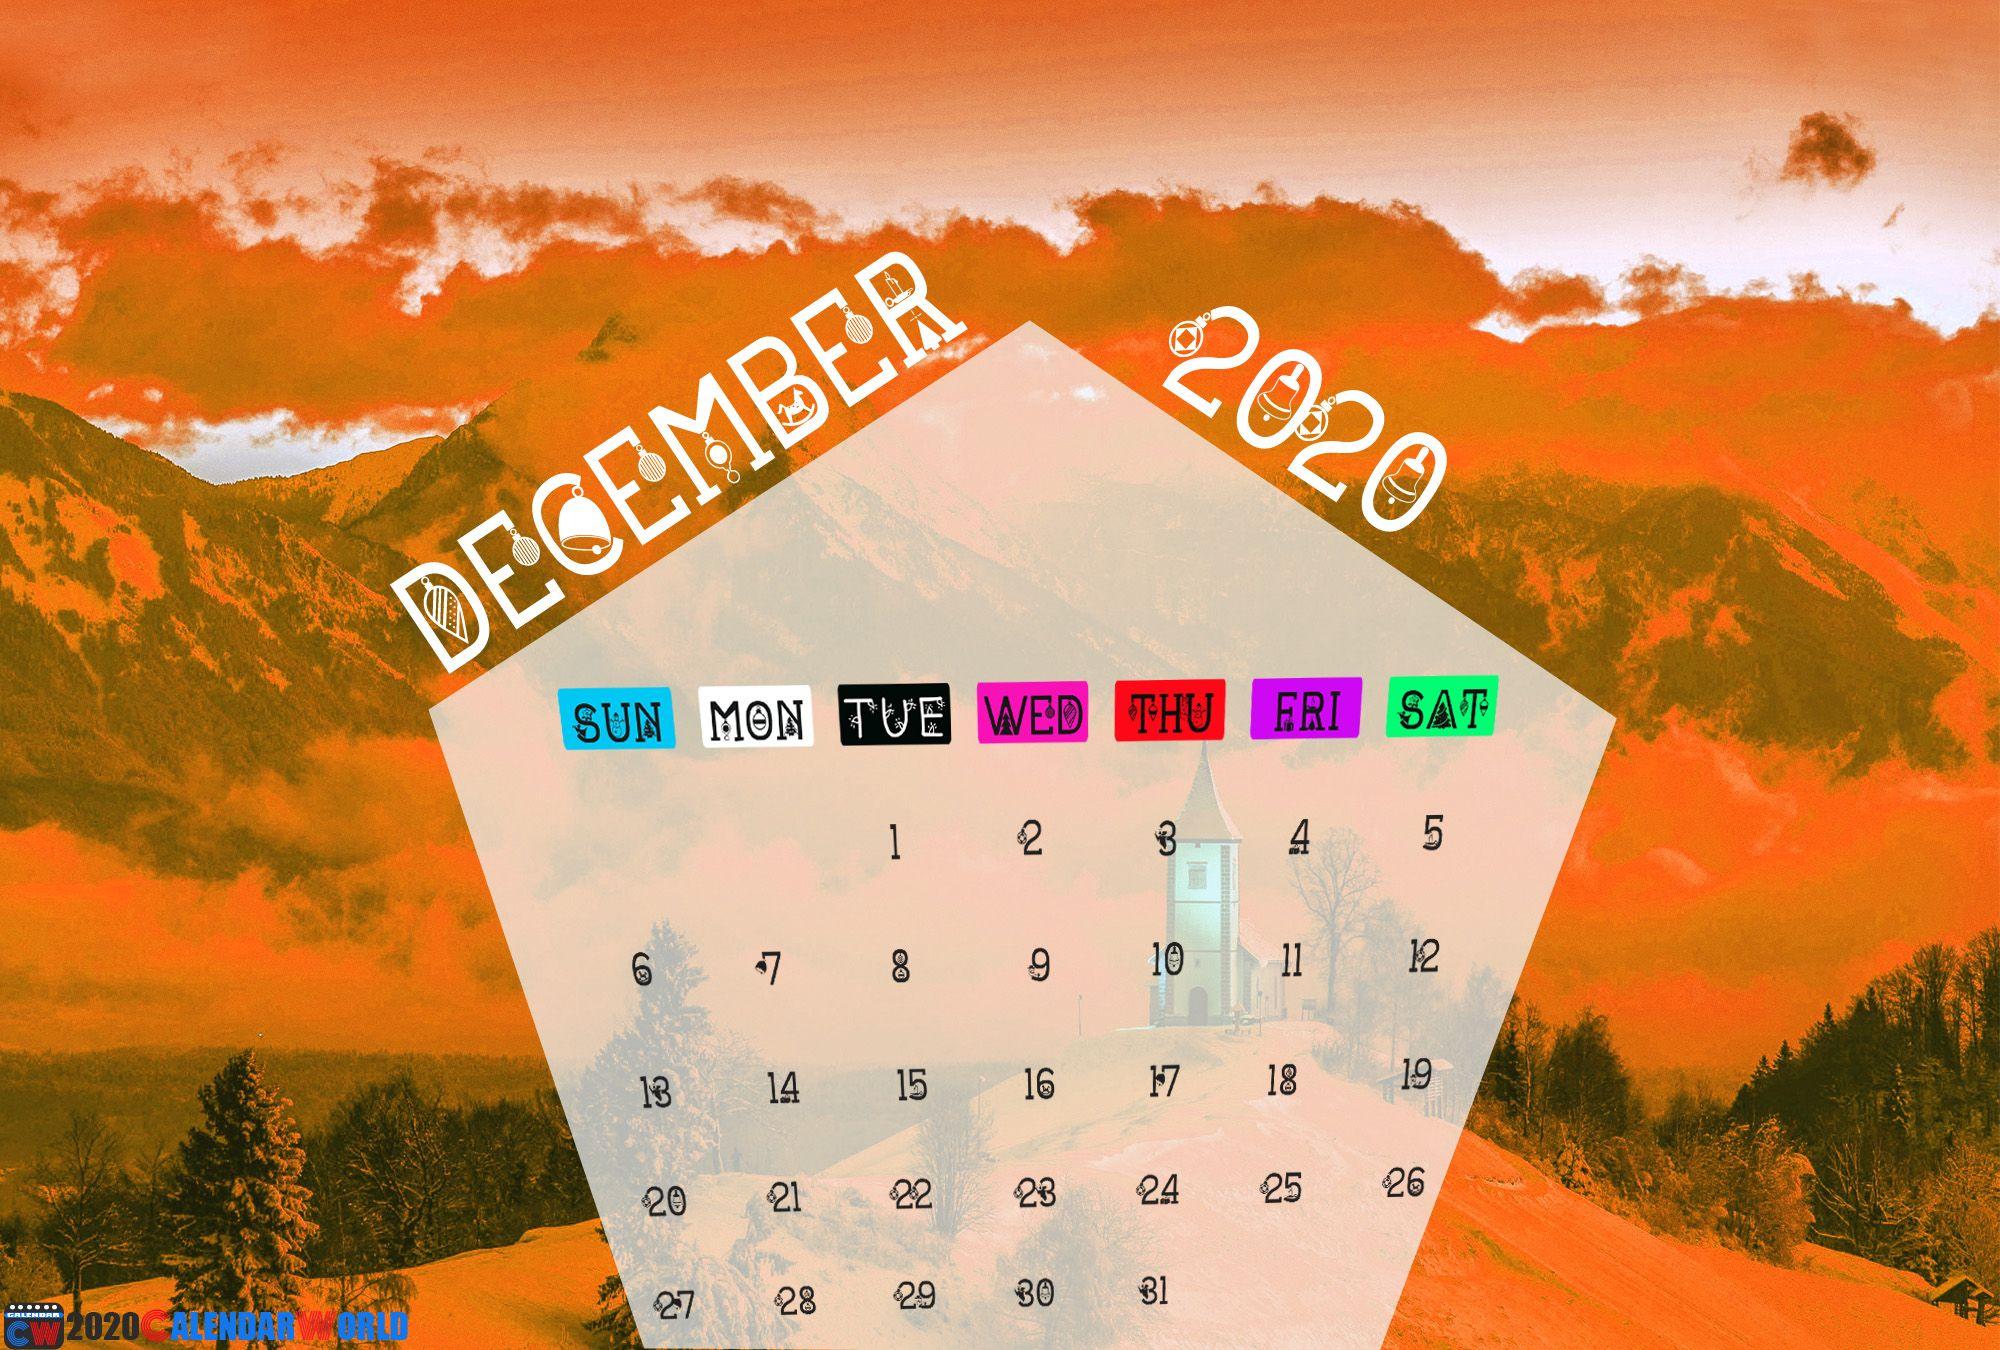 December 2020 Calendar Wallpaper for iPhone, Desktop & Tablets